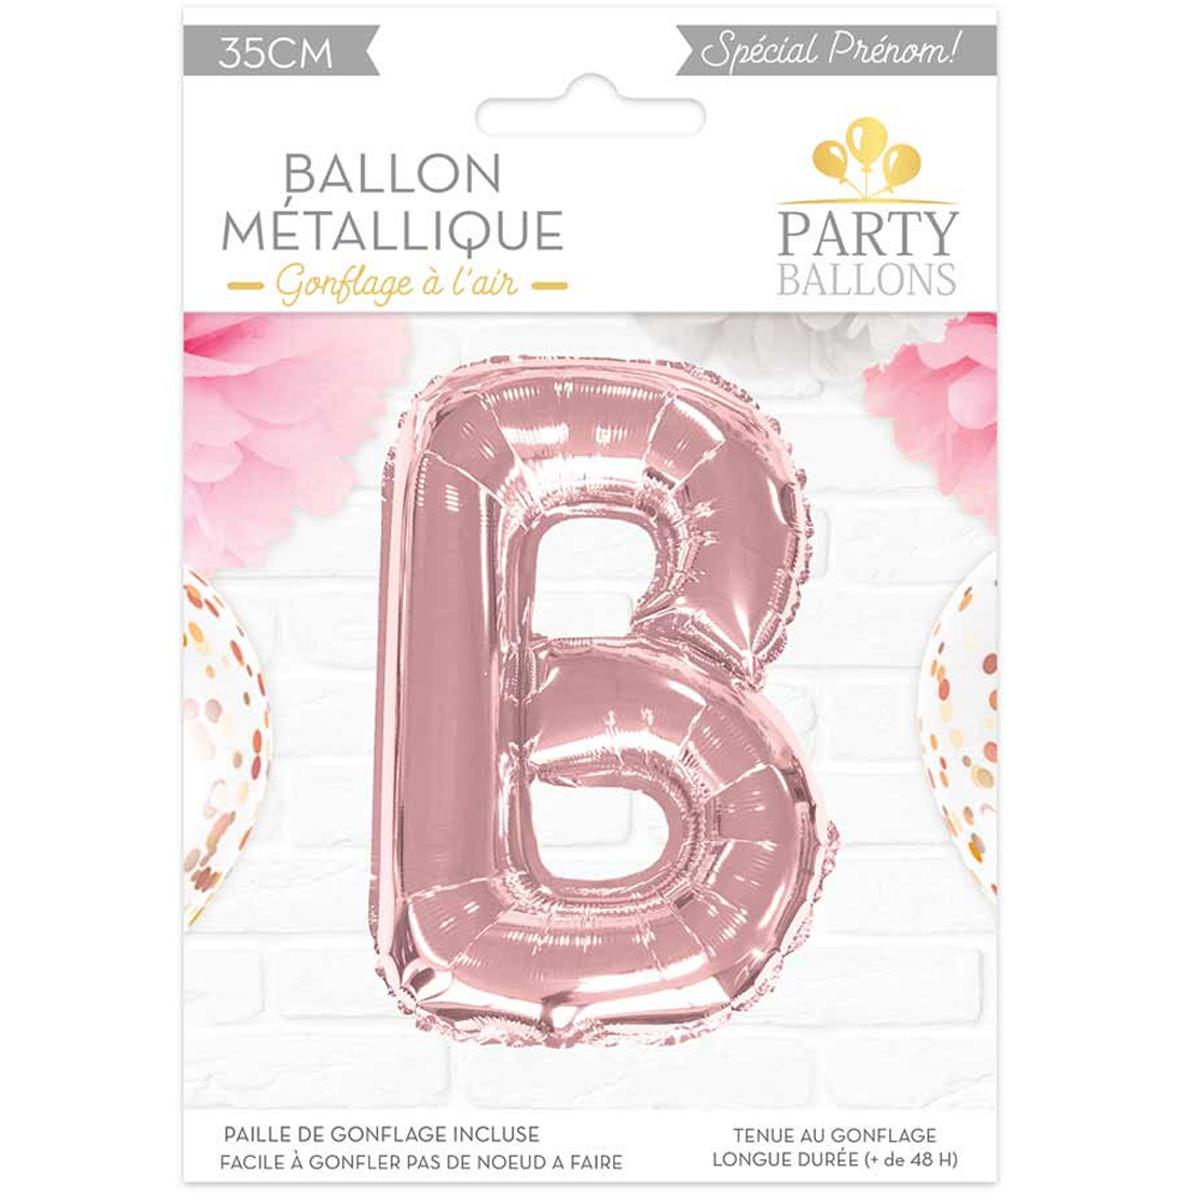 Ballon métallique \'Lettre B\' rosé - 35 cm - [A0432]